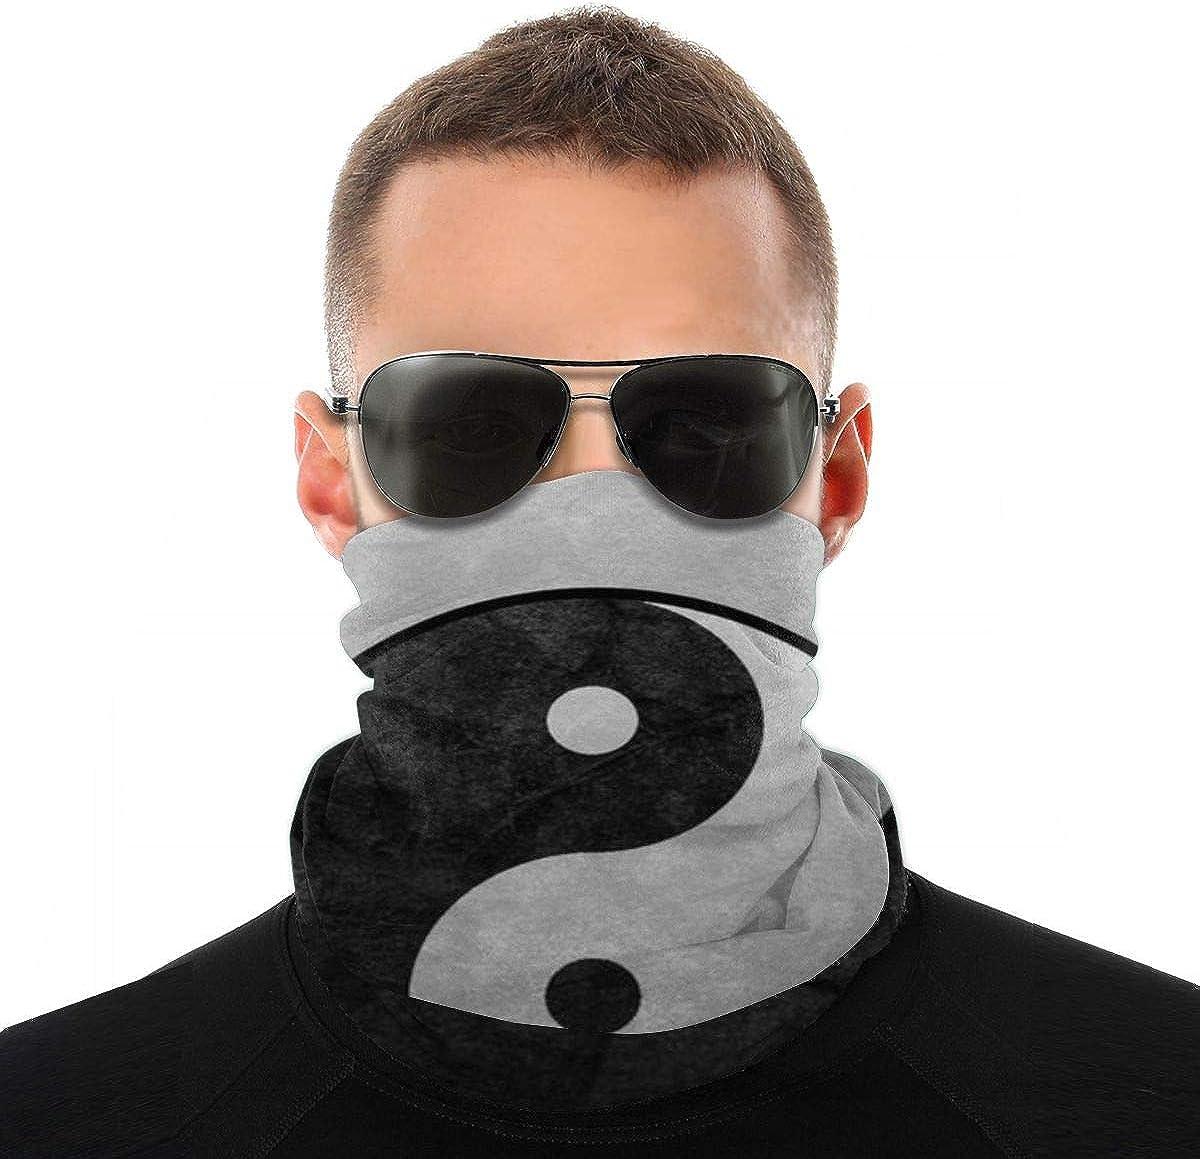 Taoist Yin Yang Tai Chi Headband Headwear Windbreak Scarf Face Mask Washable Dust Mask Balaclava Neck Bandana Double Print